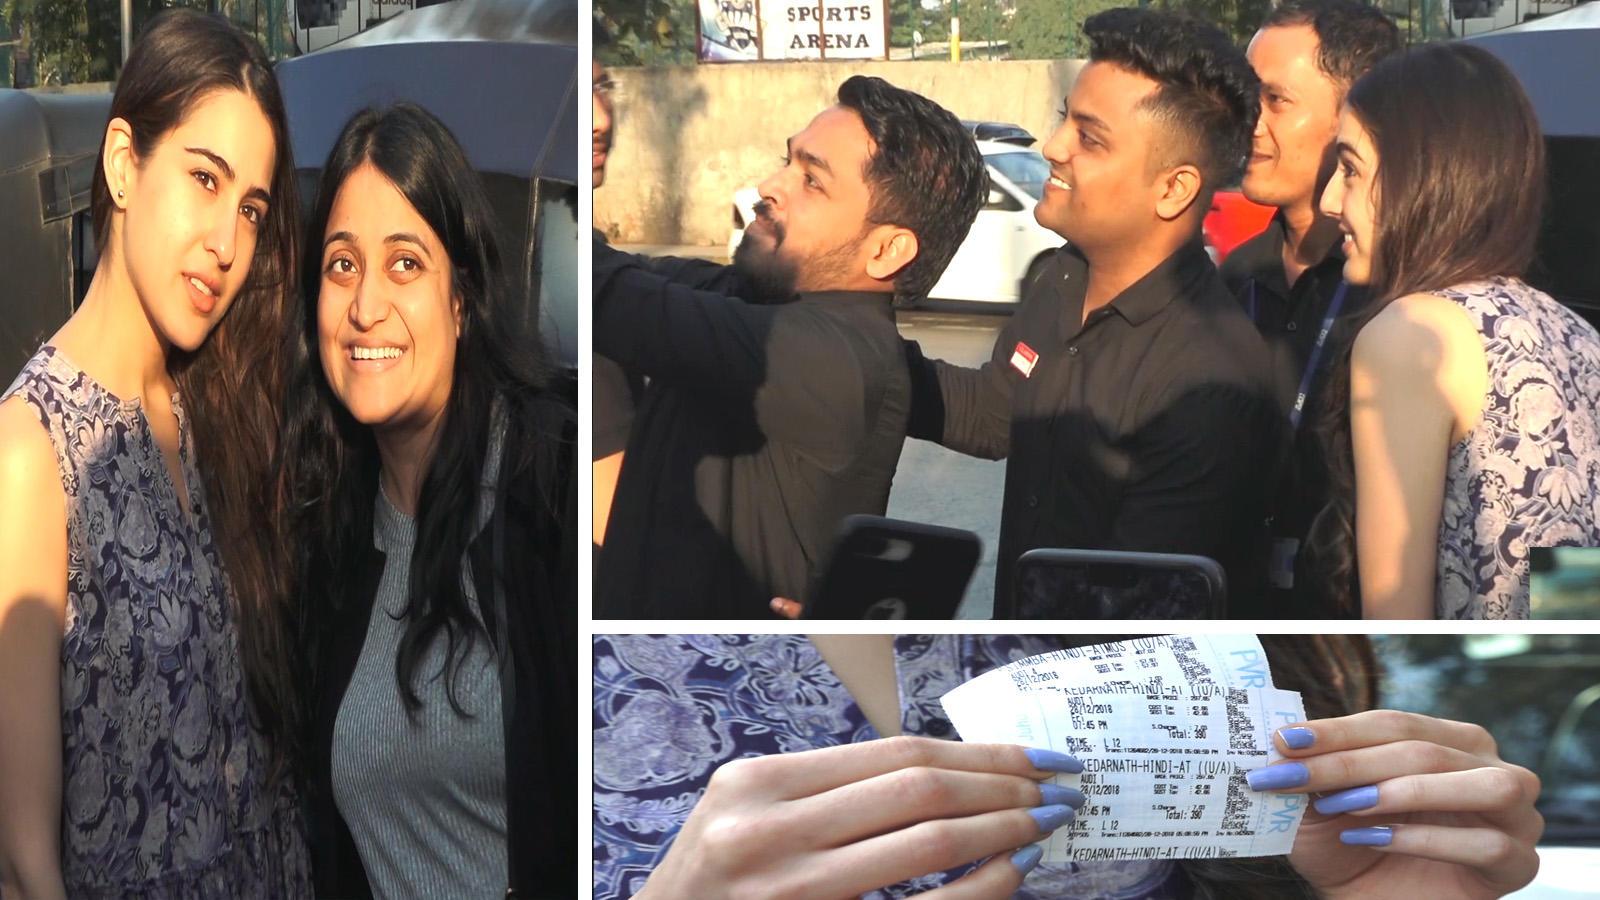 Sara Ali Khan meets fans post watching 'Simmba' and 'Kedarnath' in a movie theatre